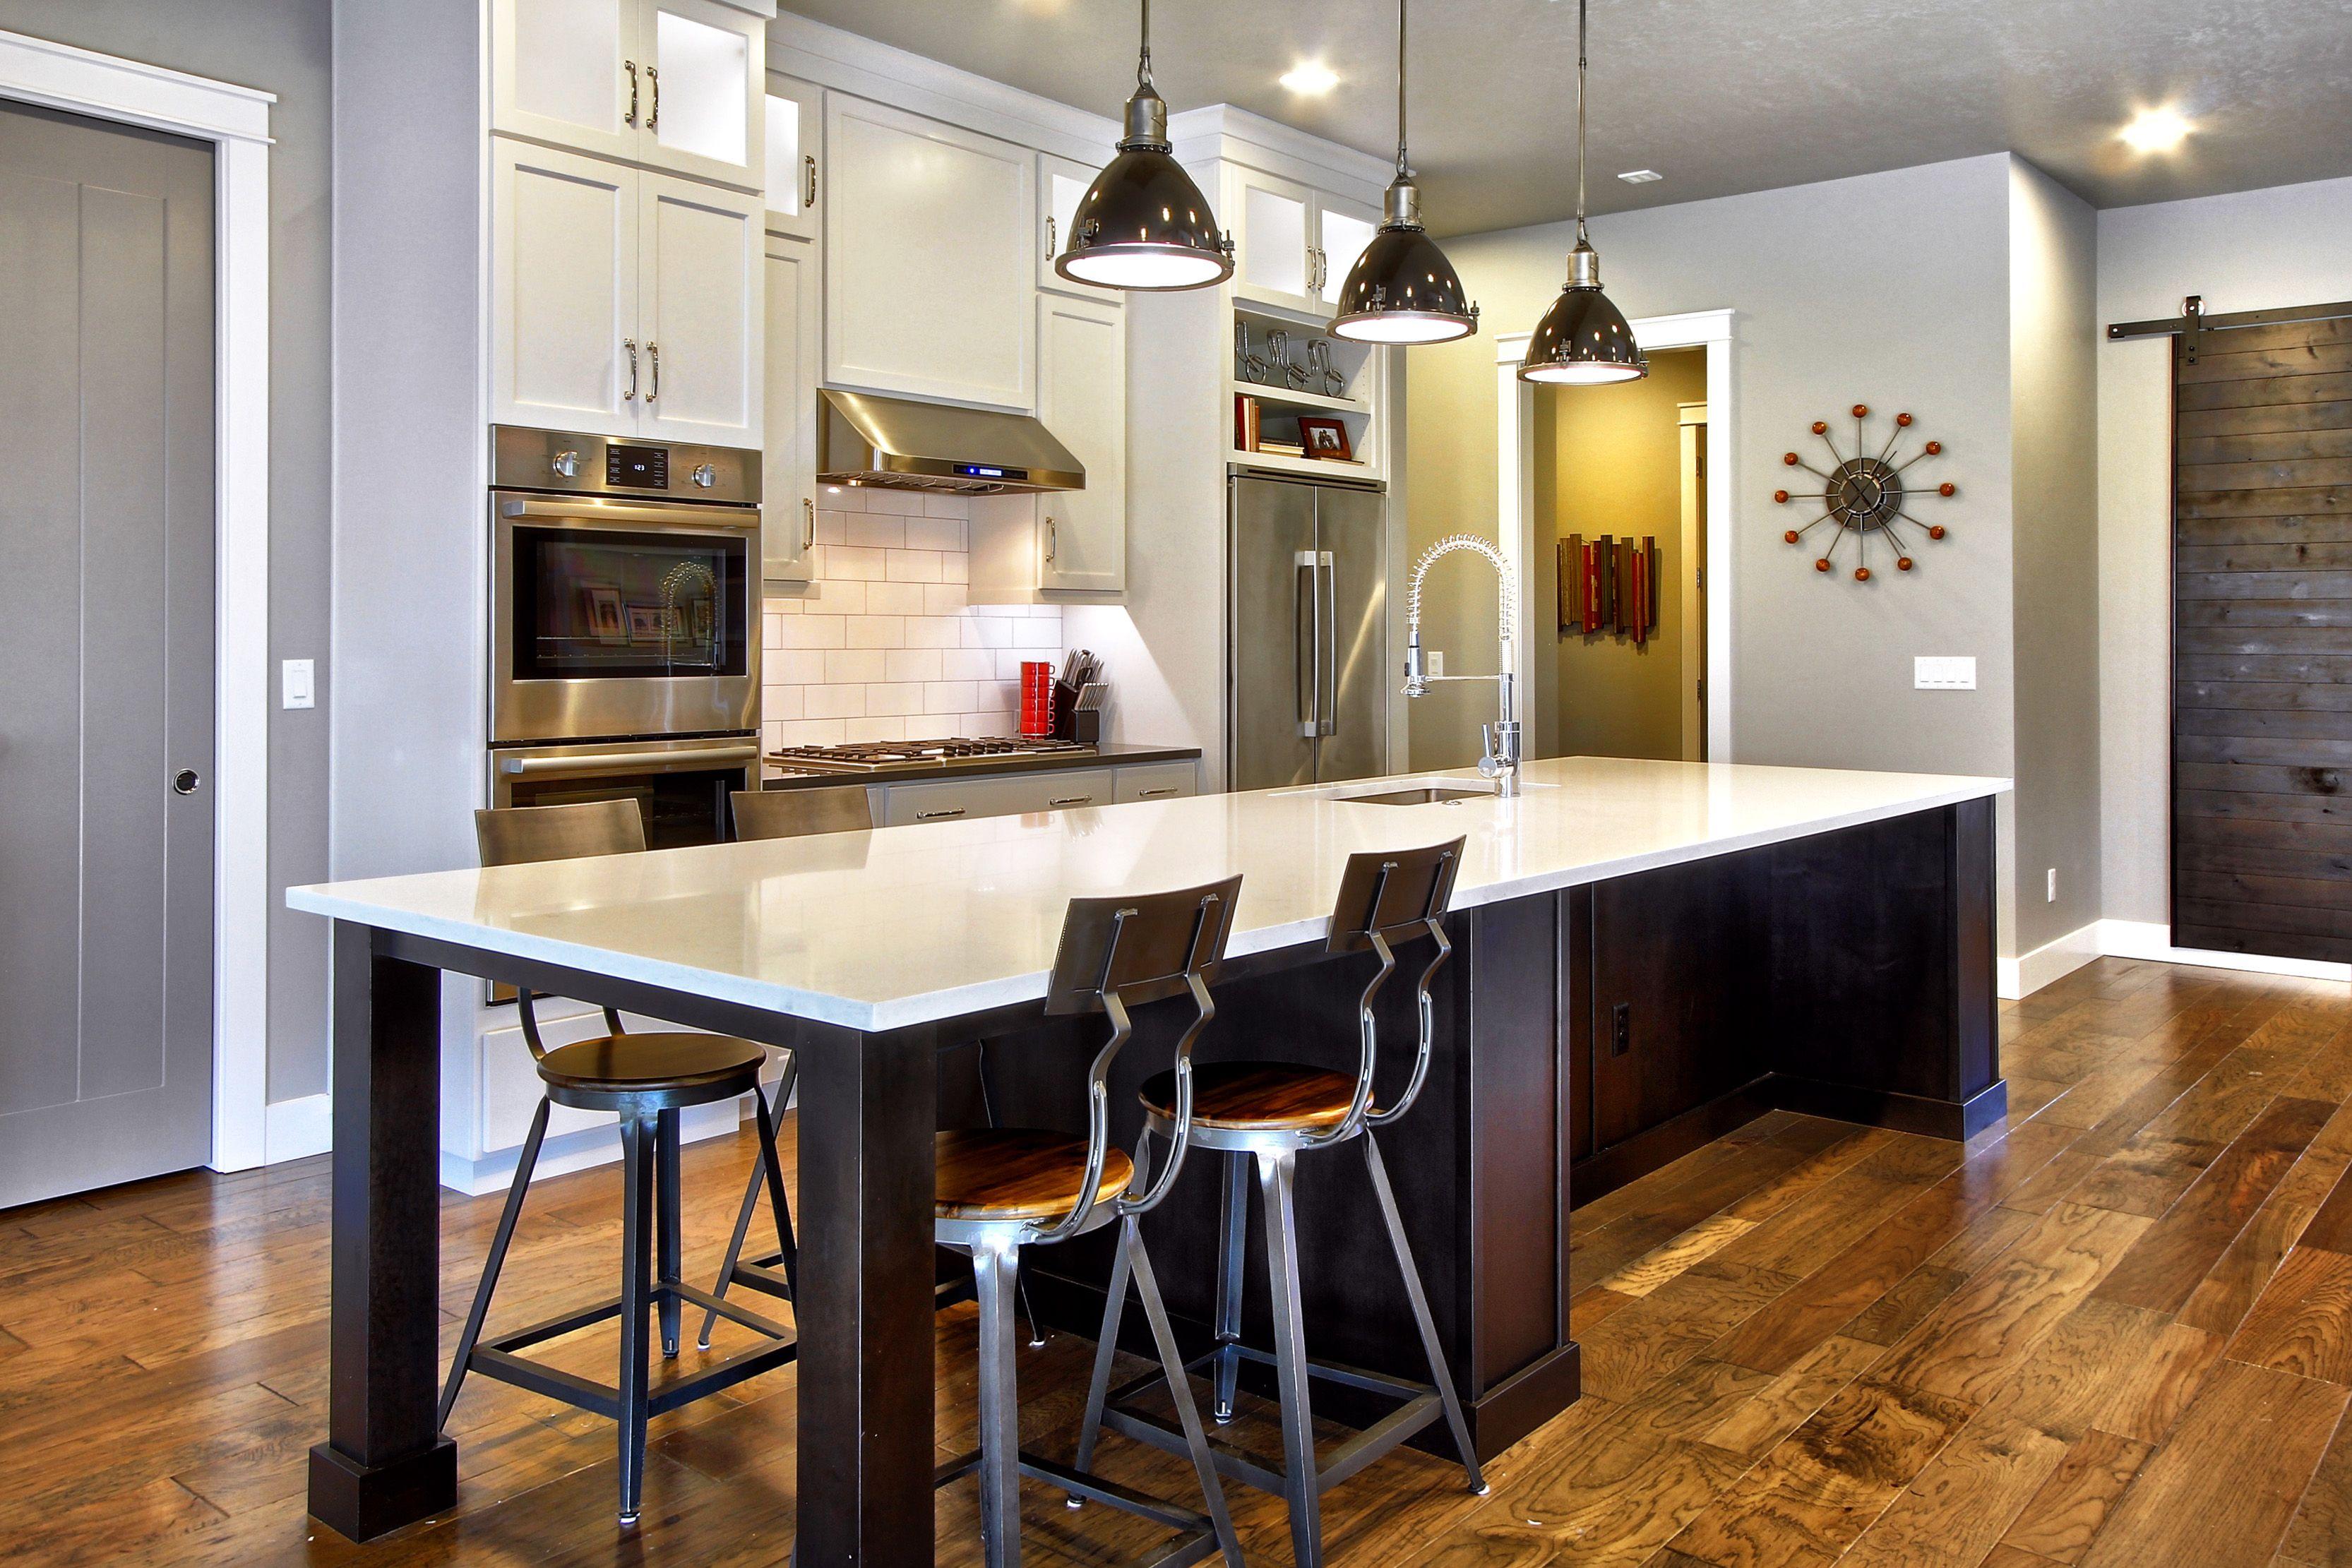 Long Quartz Island #Quartz #island #bar #kitchen #contemporary